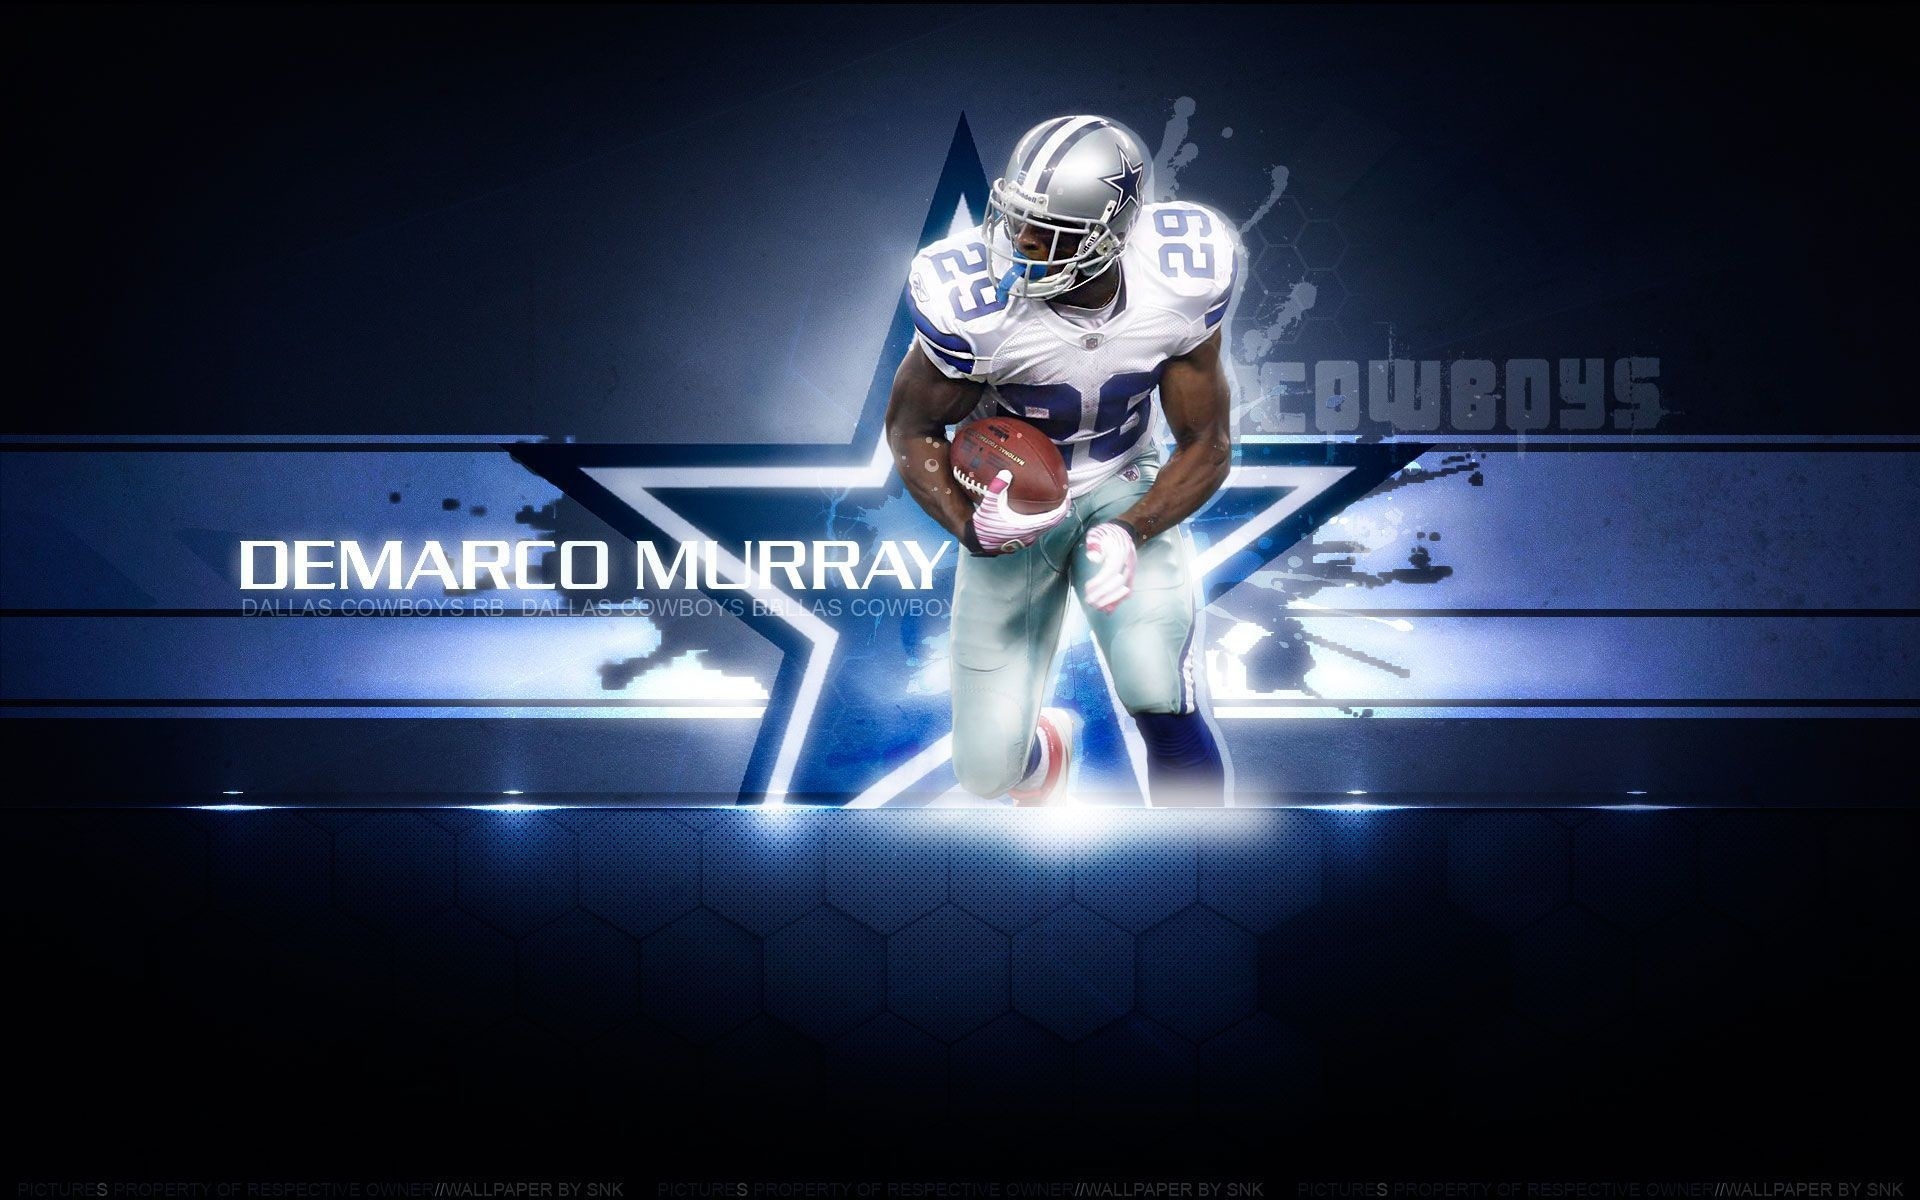 1920x1200, Demarco Murray Dallas Cowboys Wallpaper - Dallas Cowboys Thanksgiving - HD Wallpaper